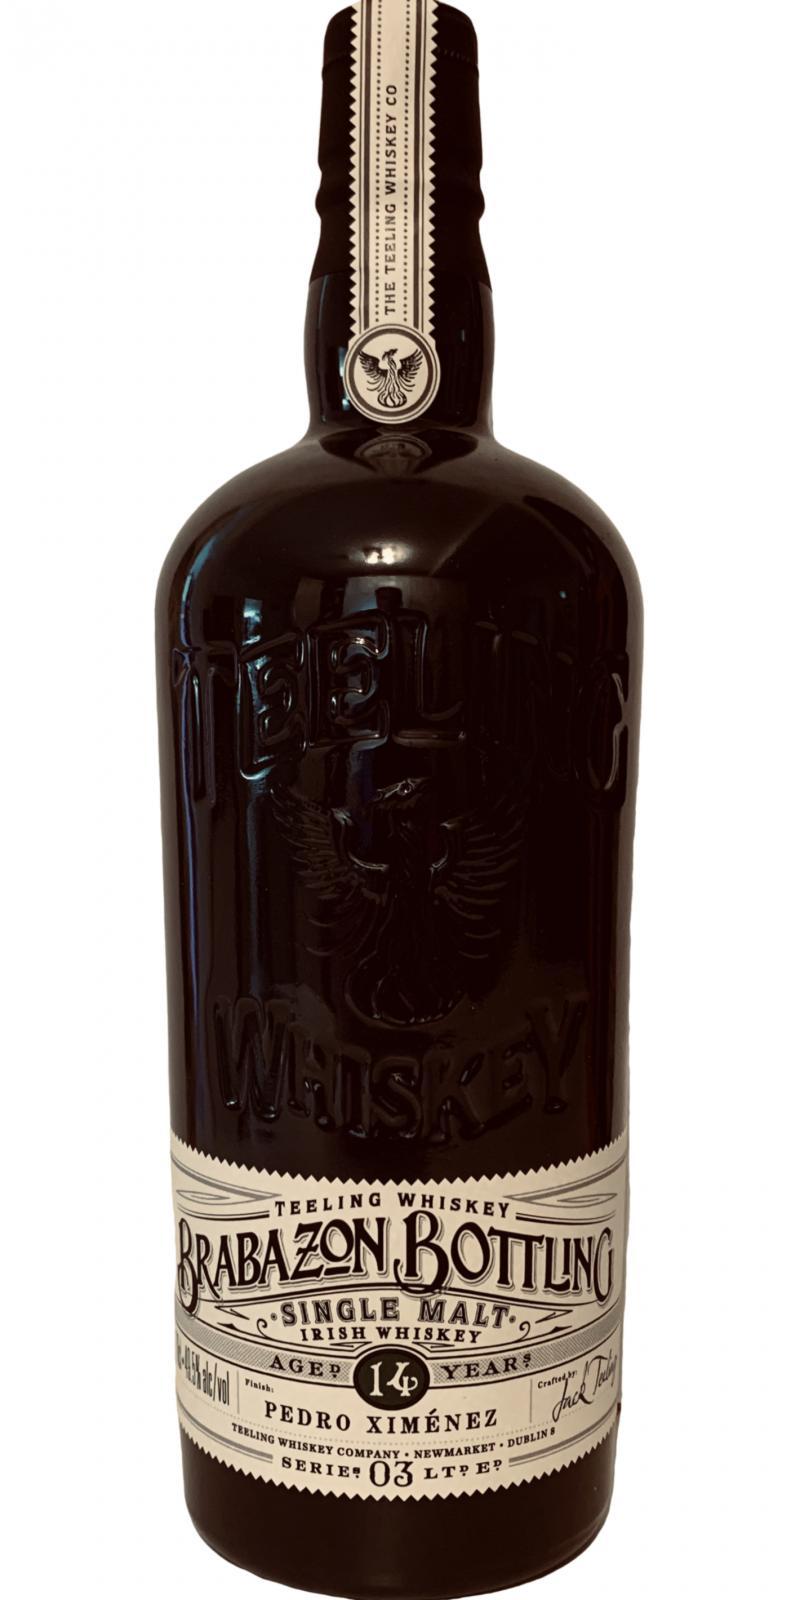 Teeling Brabazon Bottling Series 03